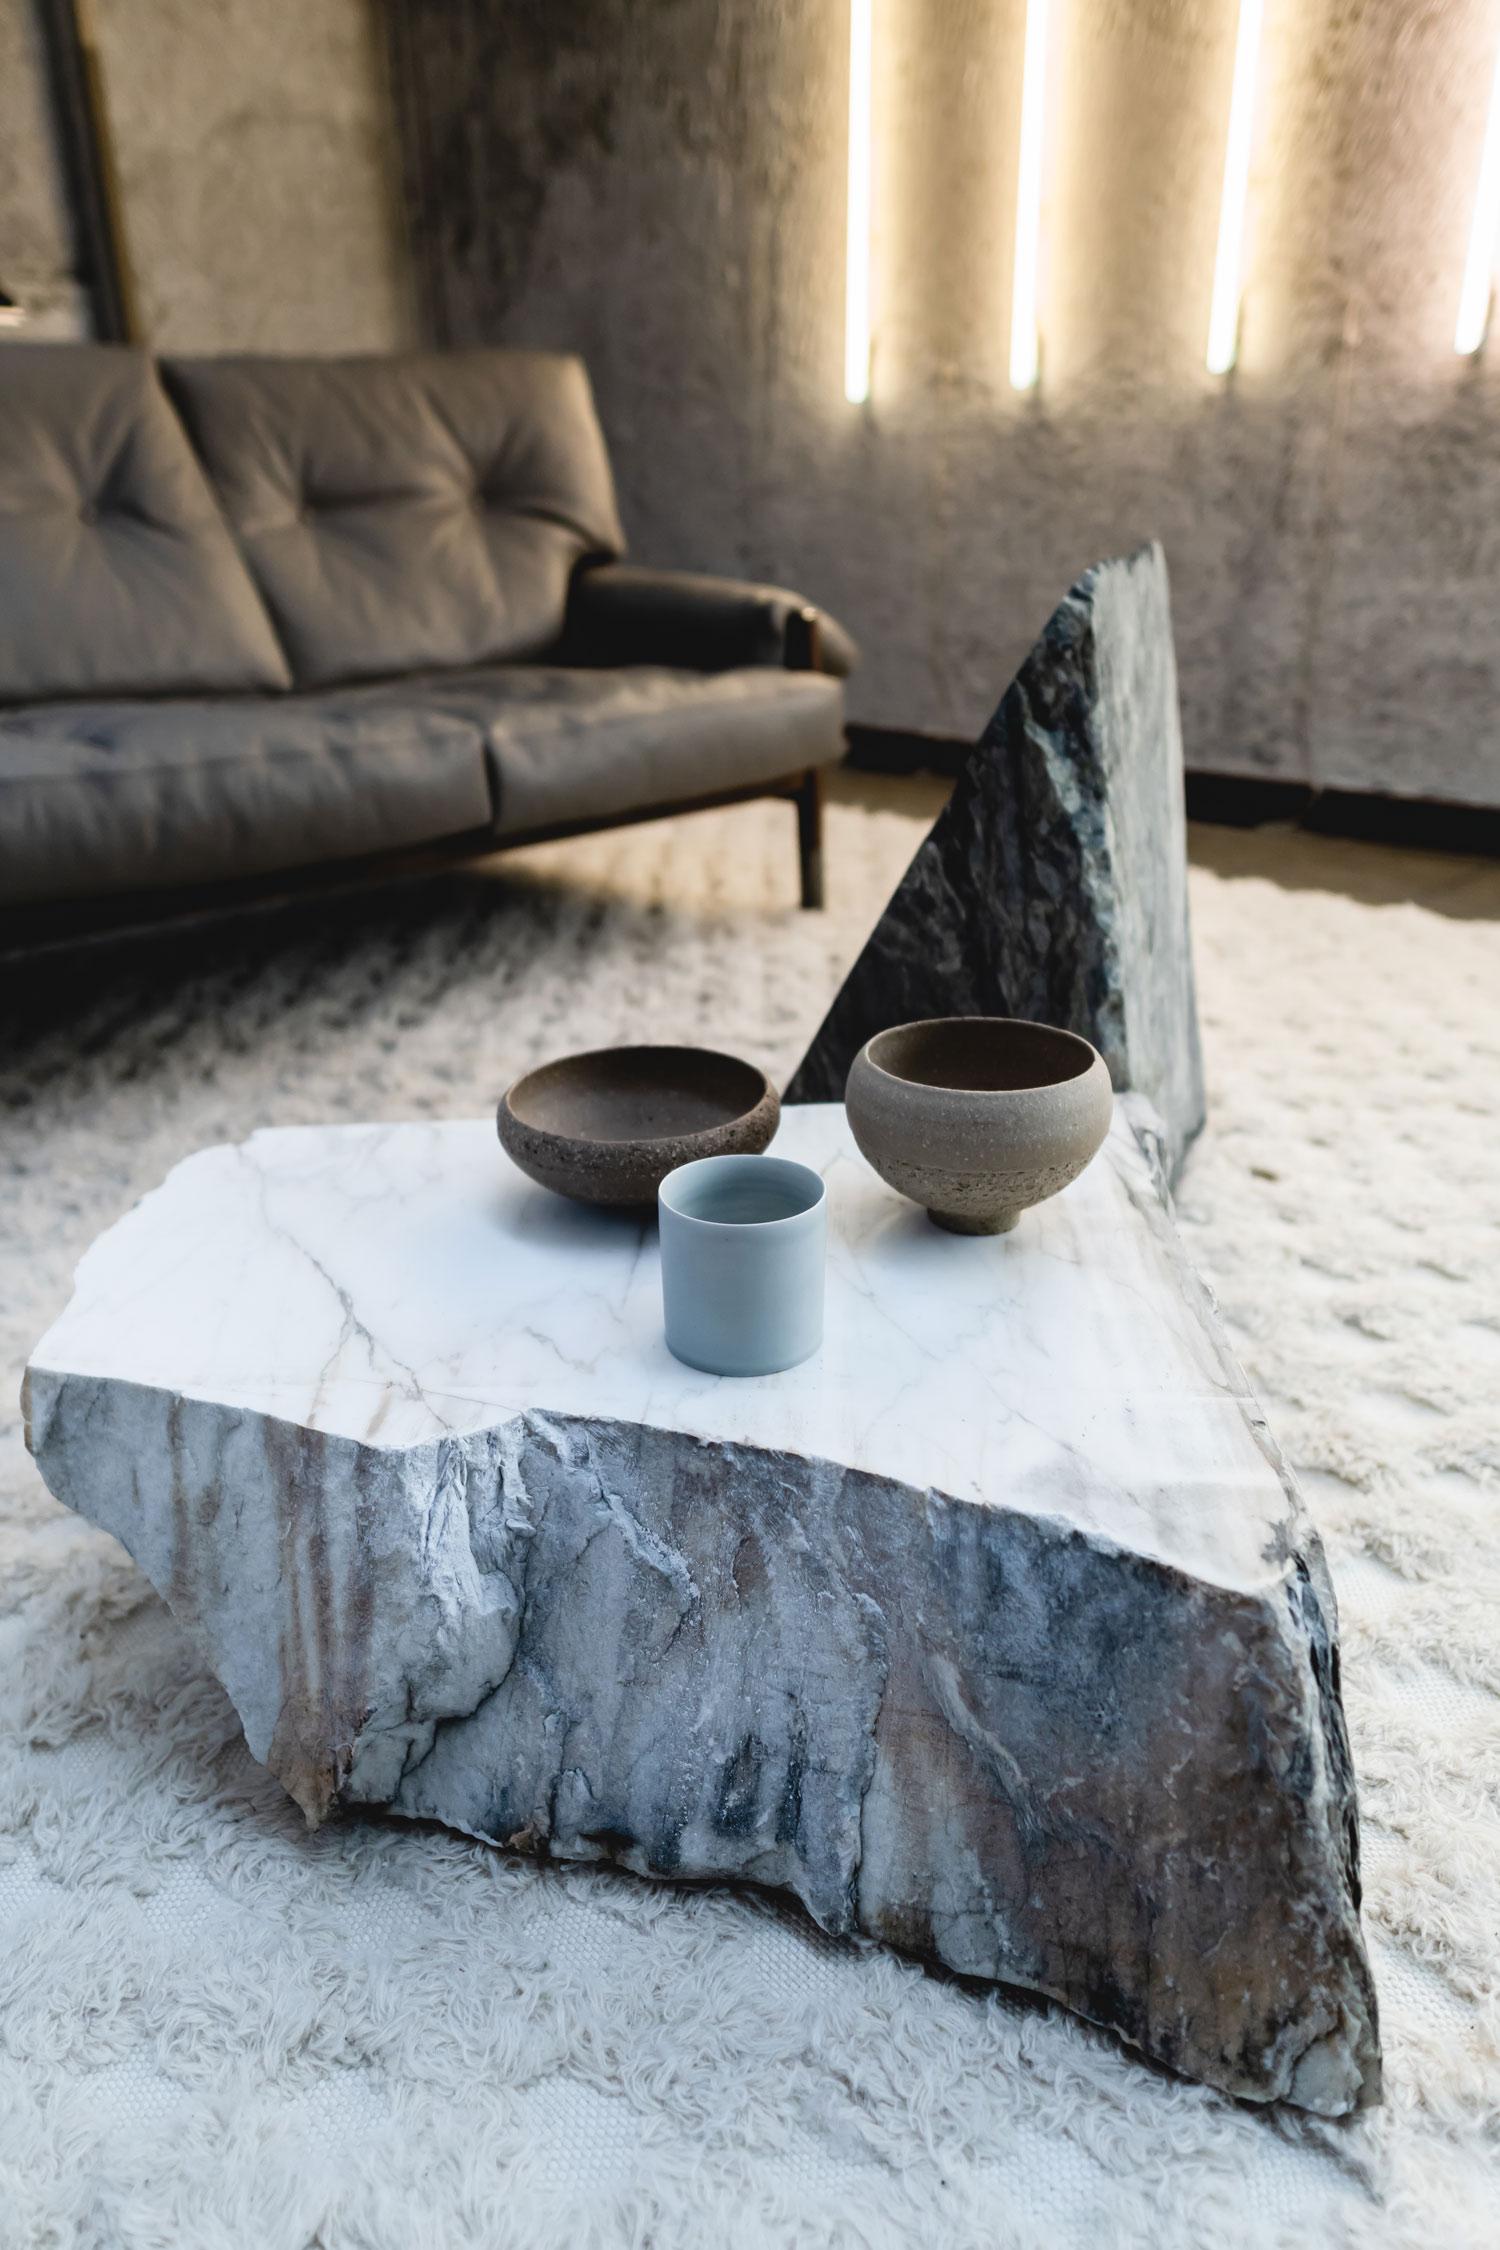 Interior design trends for 2020_Interior design trends 2020_Marble interior design trend_Authentic Interior design blog